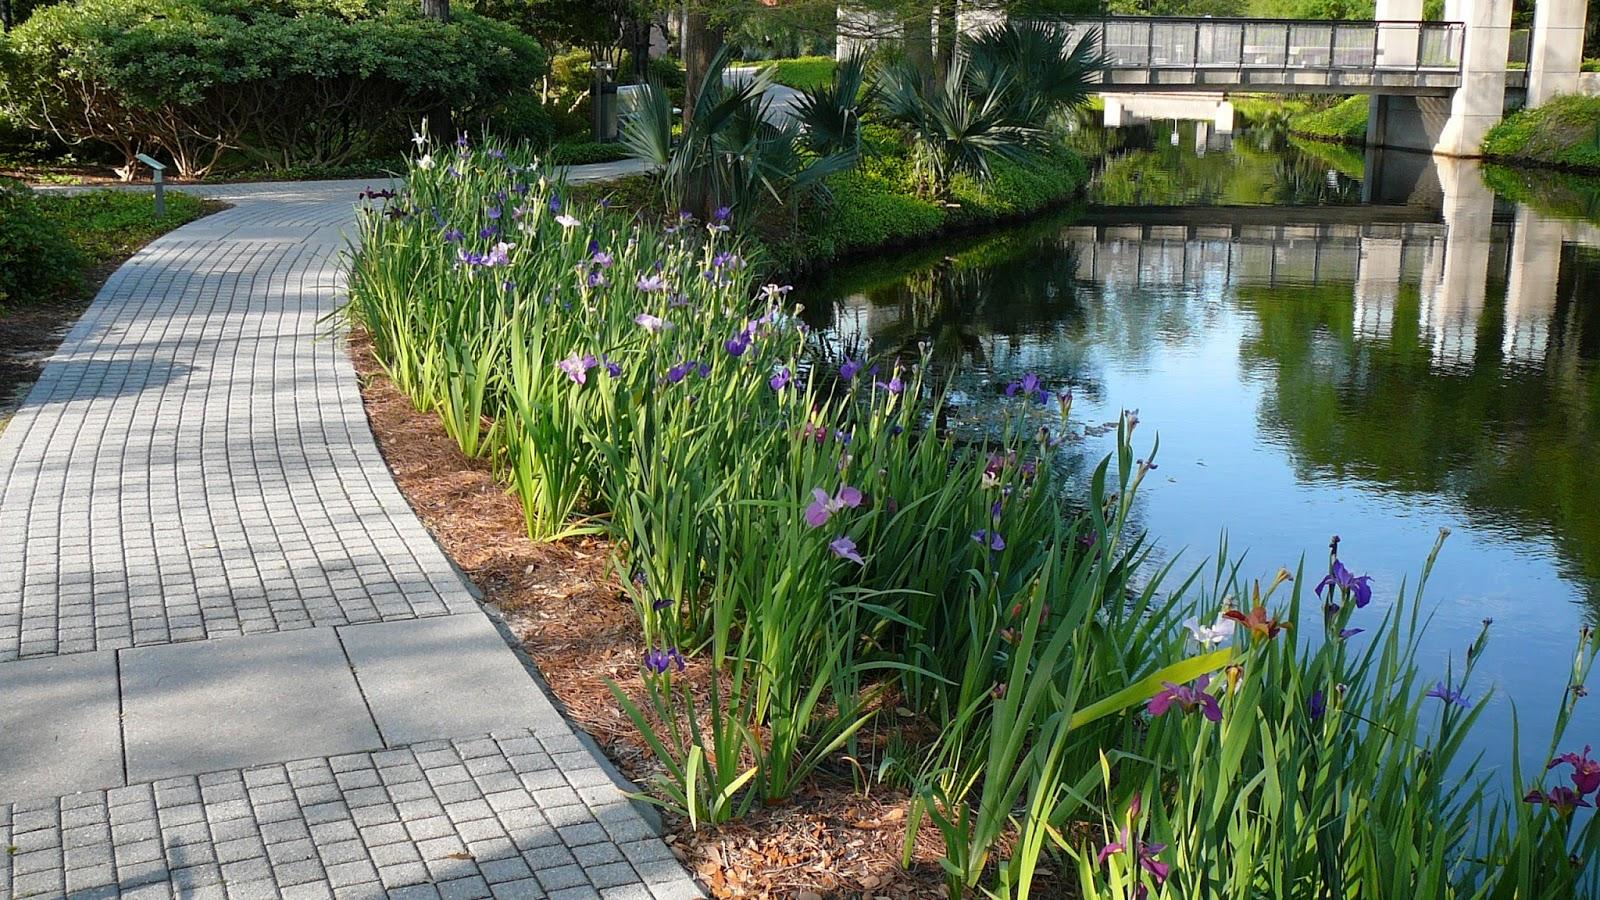 Louisiana rainbow iris festival new orleans museum of art - Sydney and walda besthoff sculpture garden ...